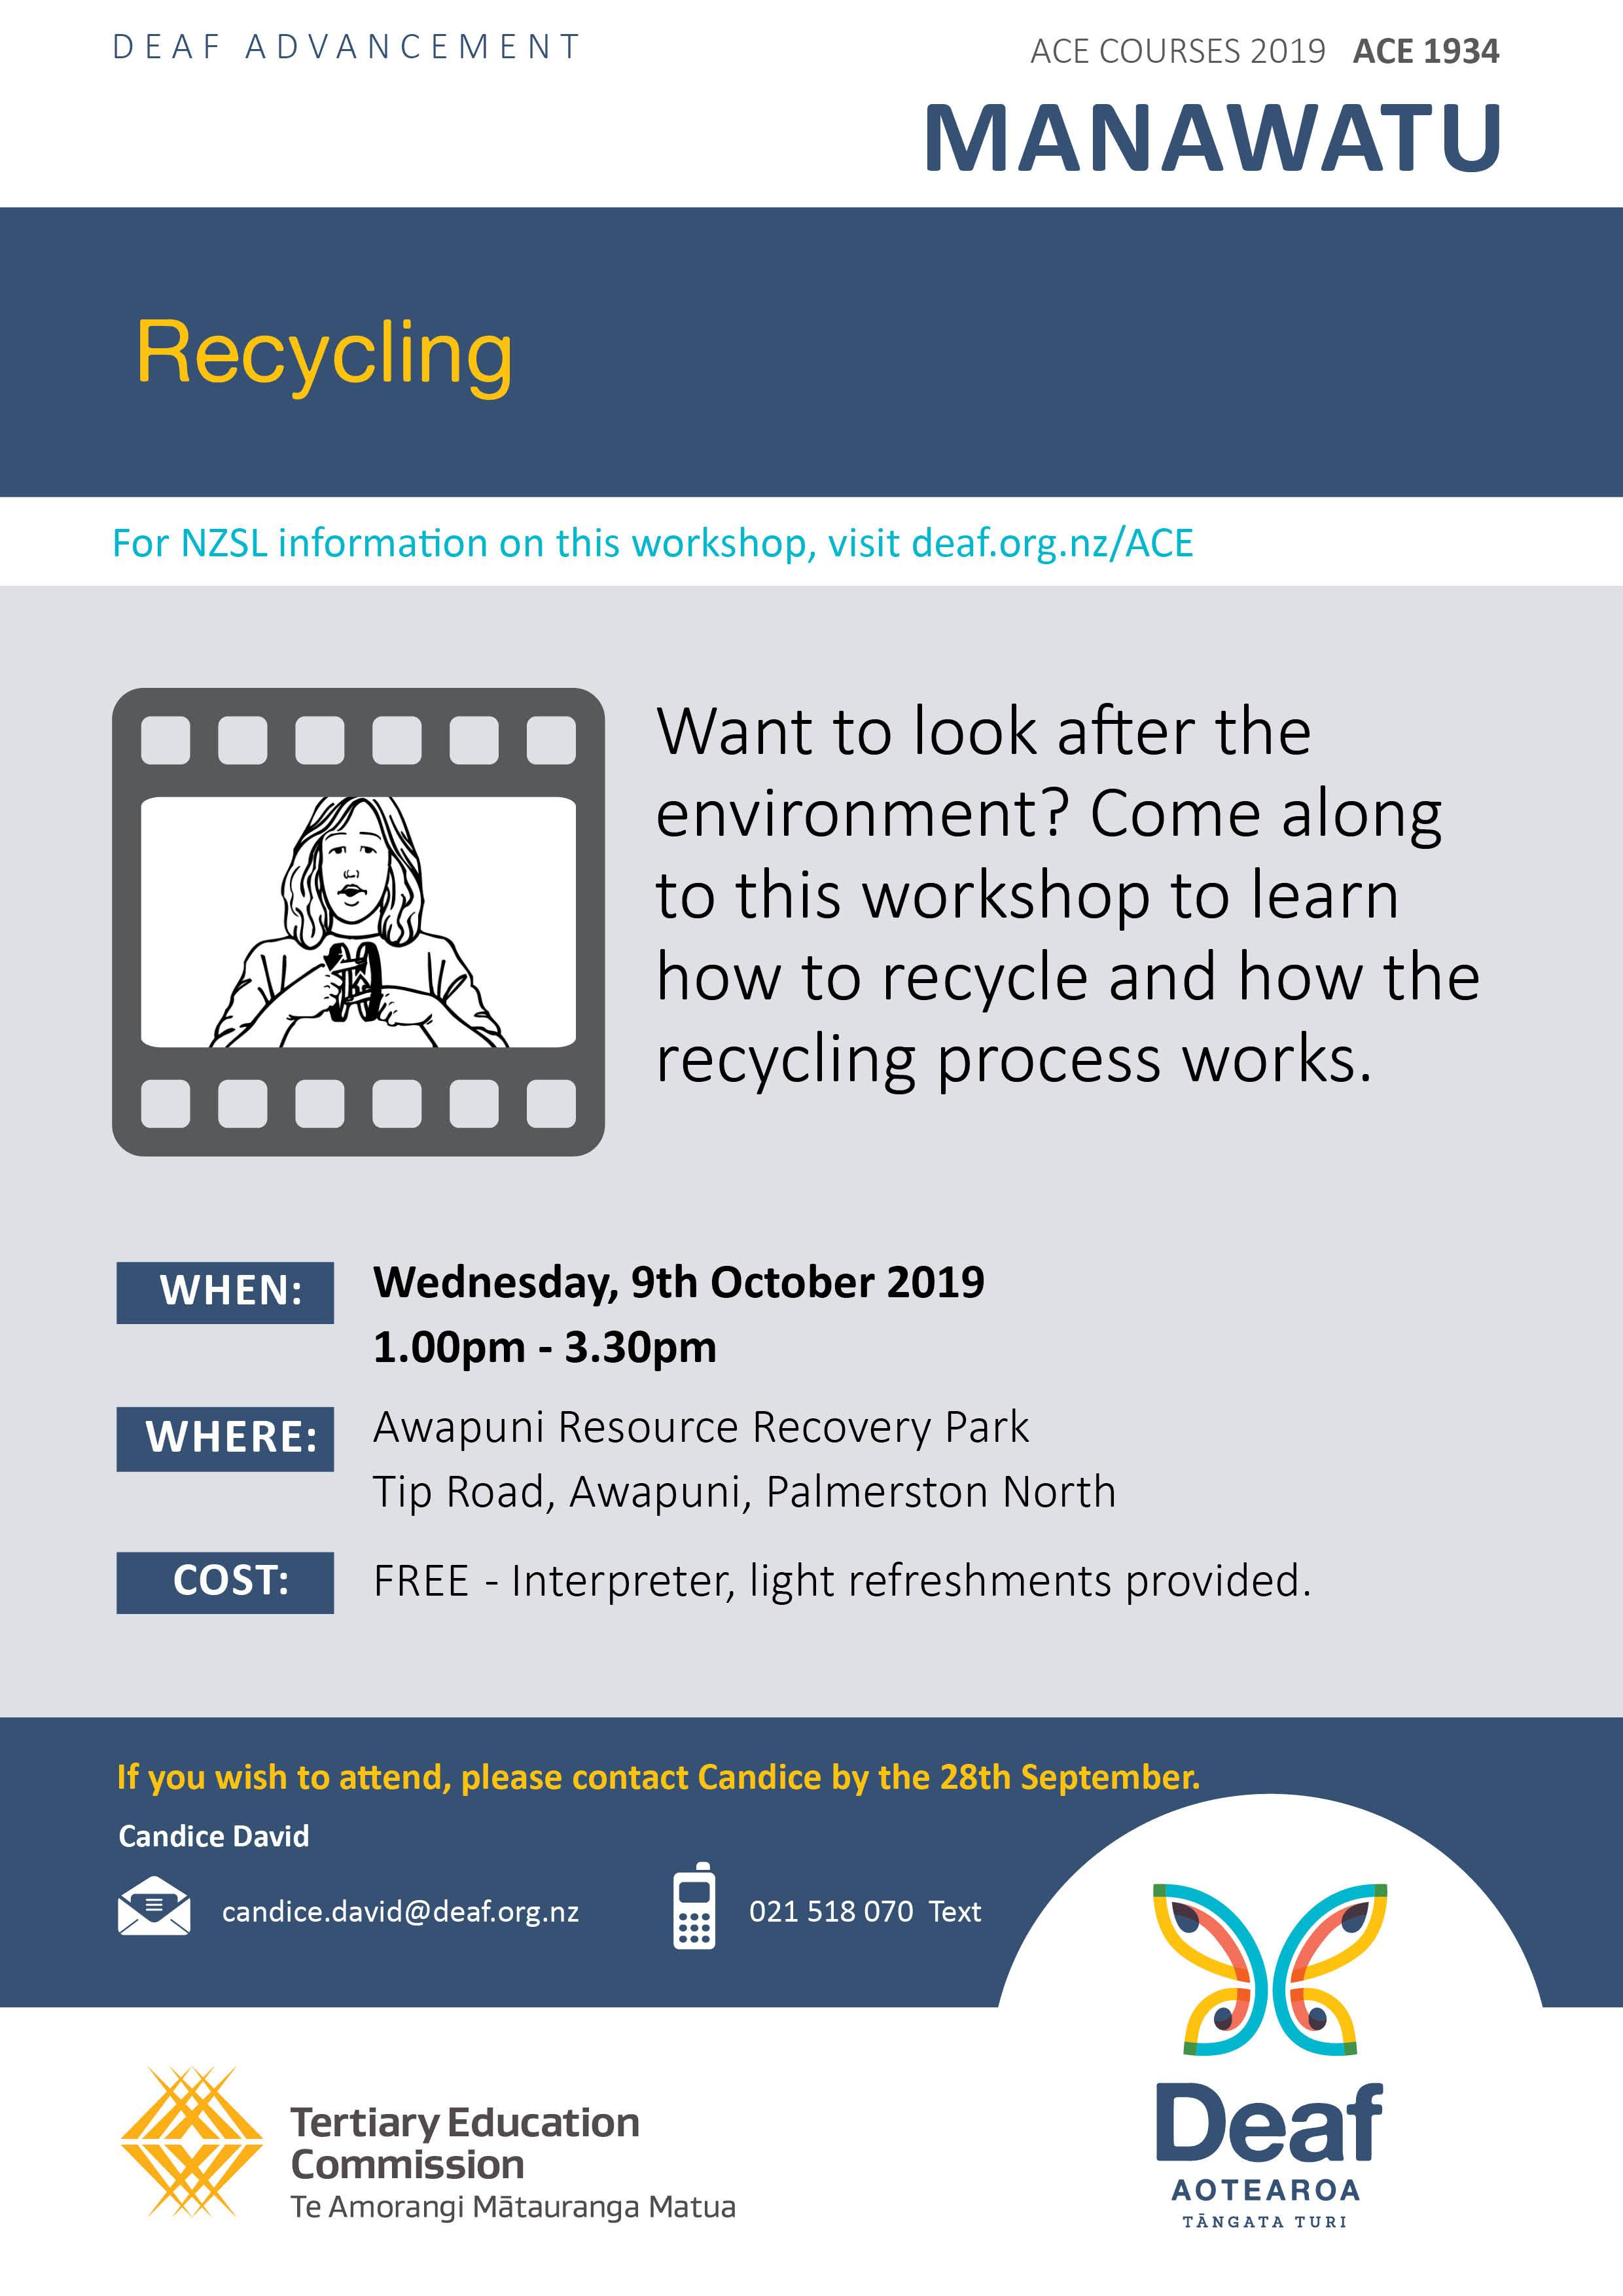 ACE Course Manawatu Recycling 2019